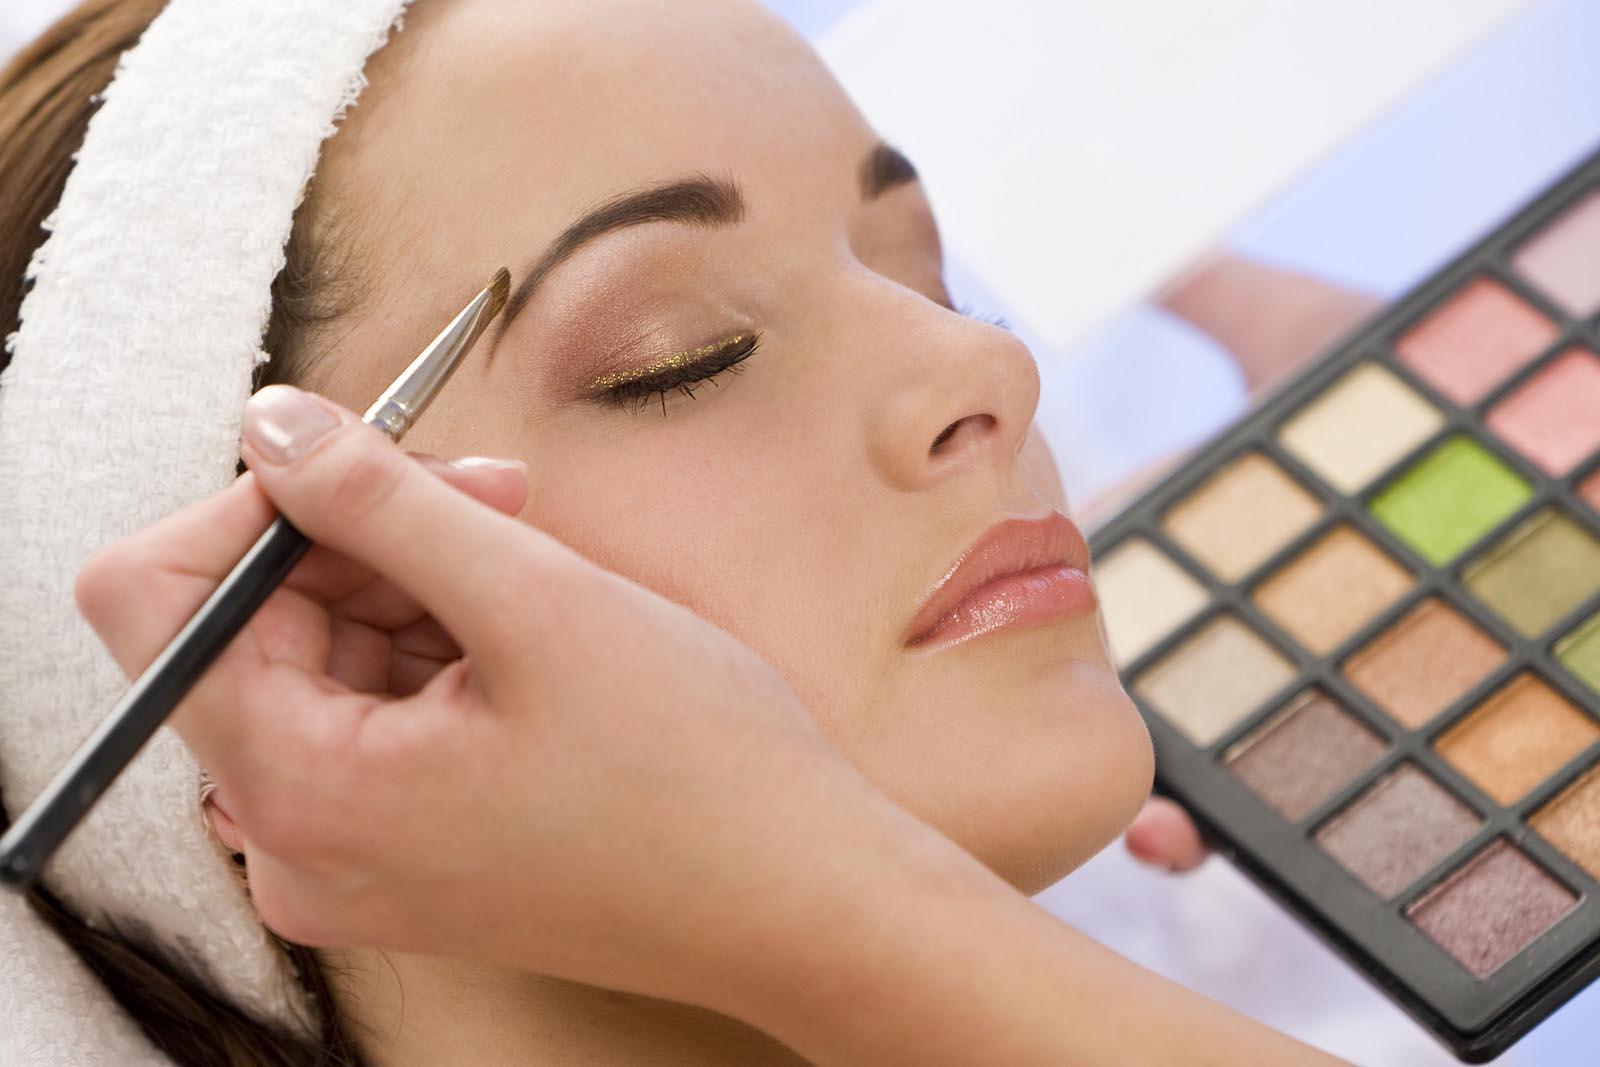 maquillage a lyon